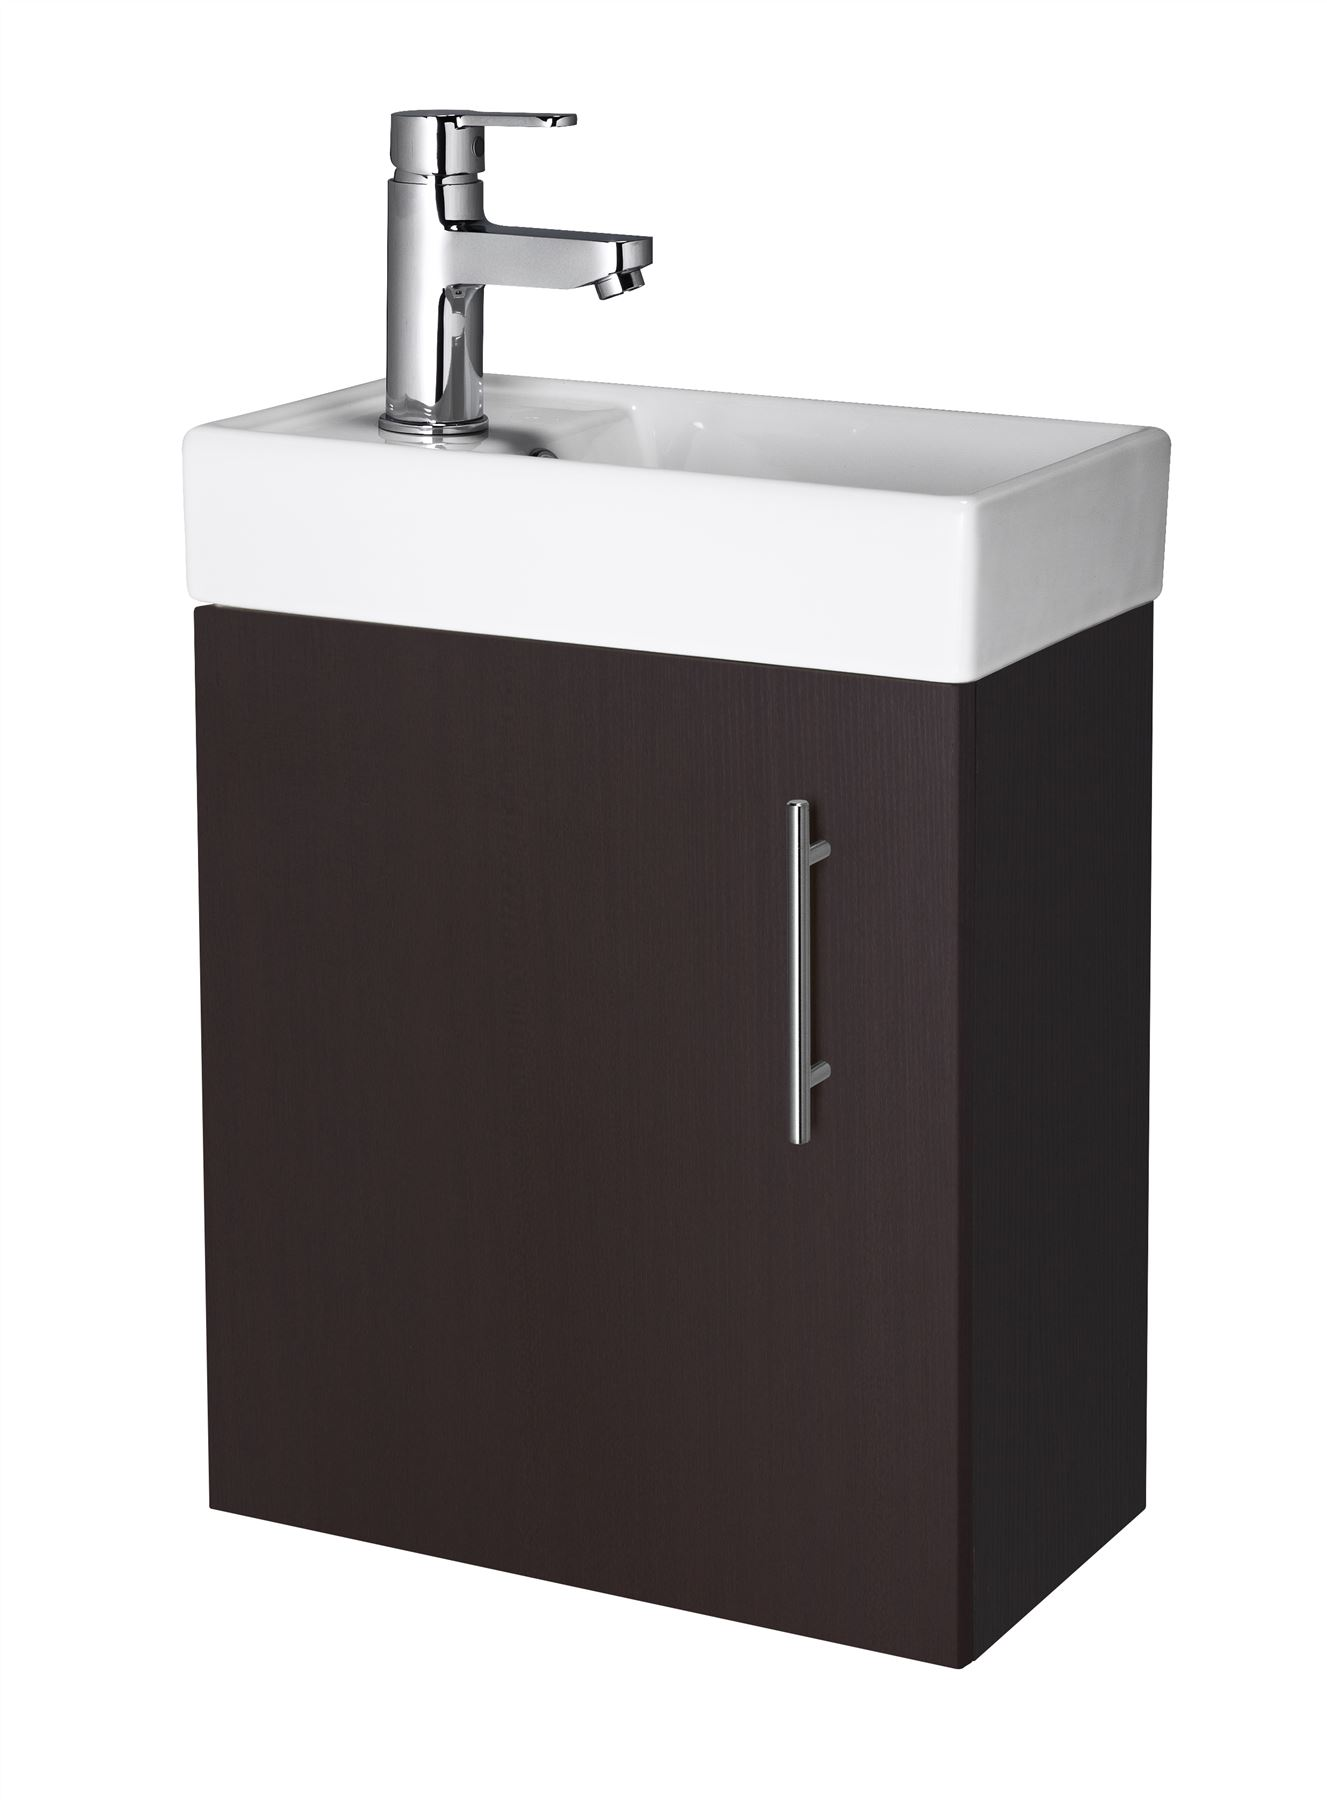 Compact 400mm Bathroom Cloakroom Vanity Unit amp Basin. Compact 400mm Bathroom Cloakroom Vanity Unit  amp  Basin Sink